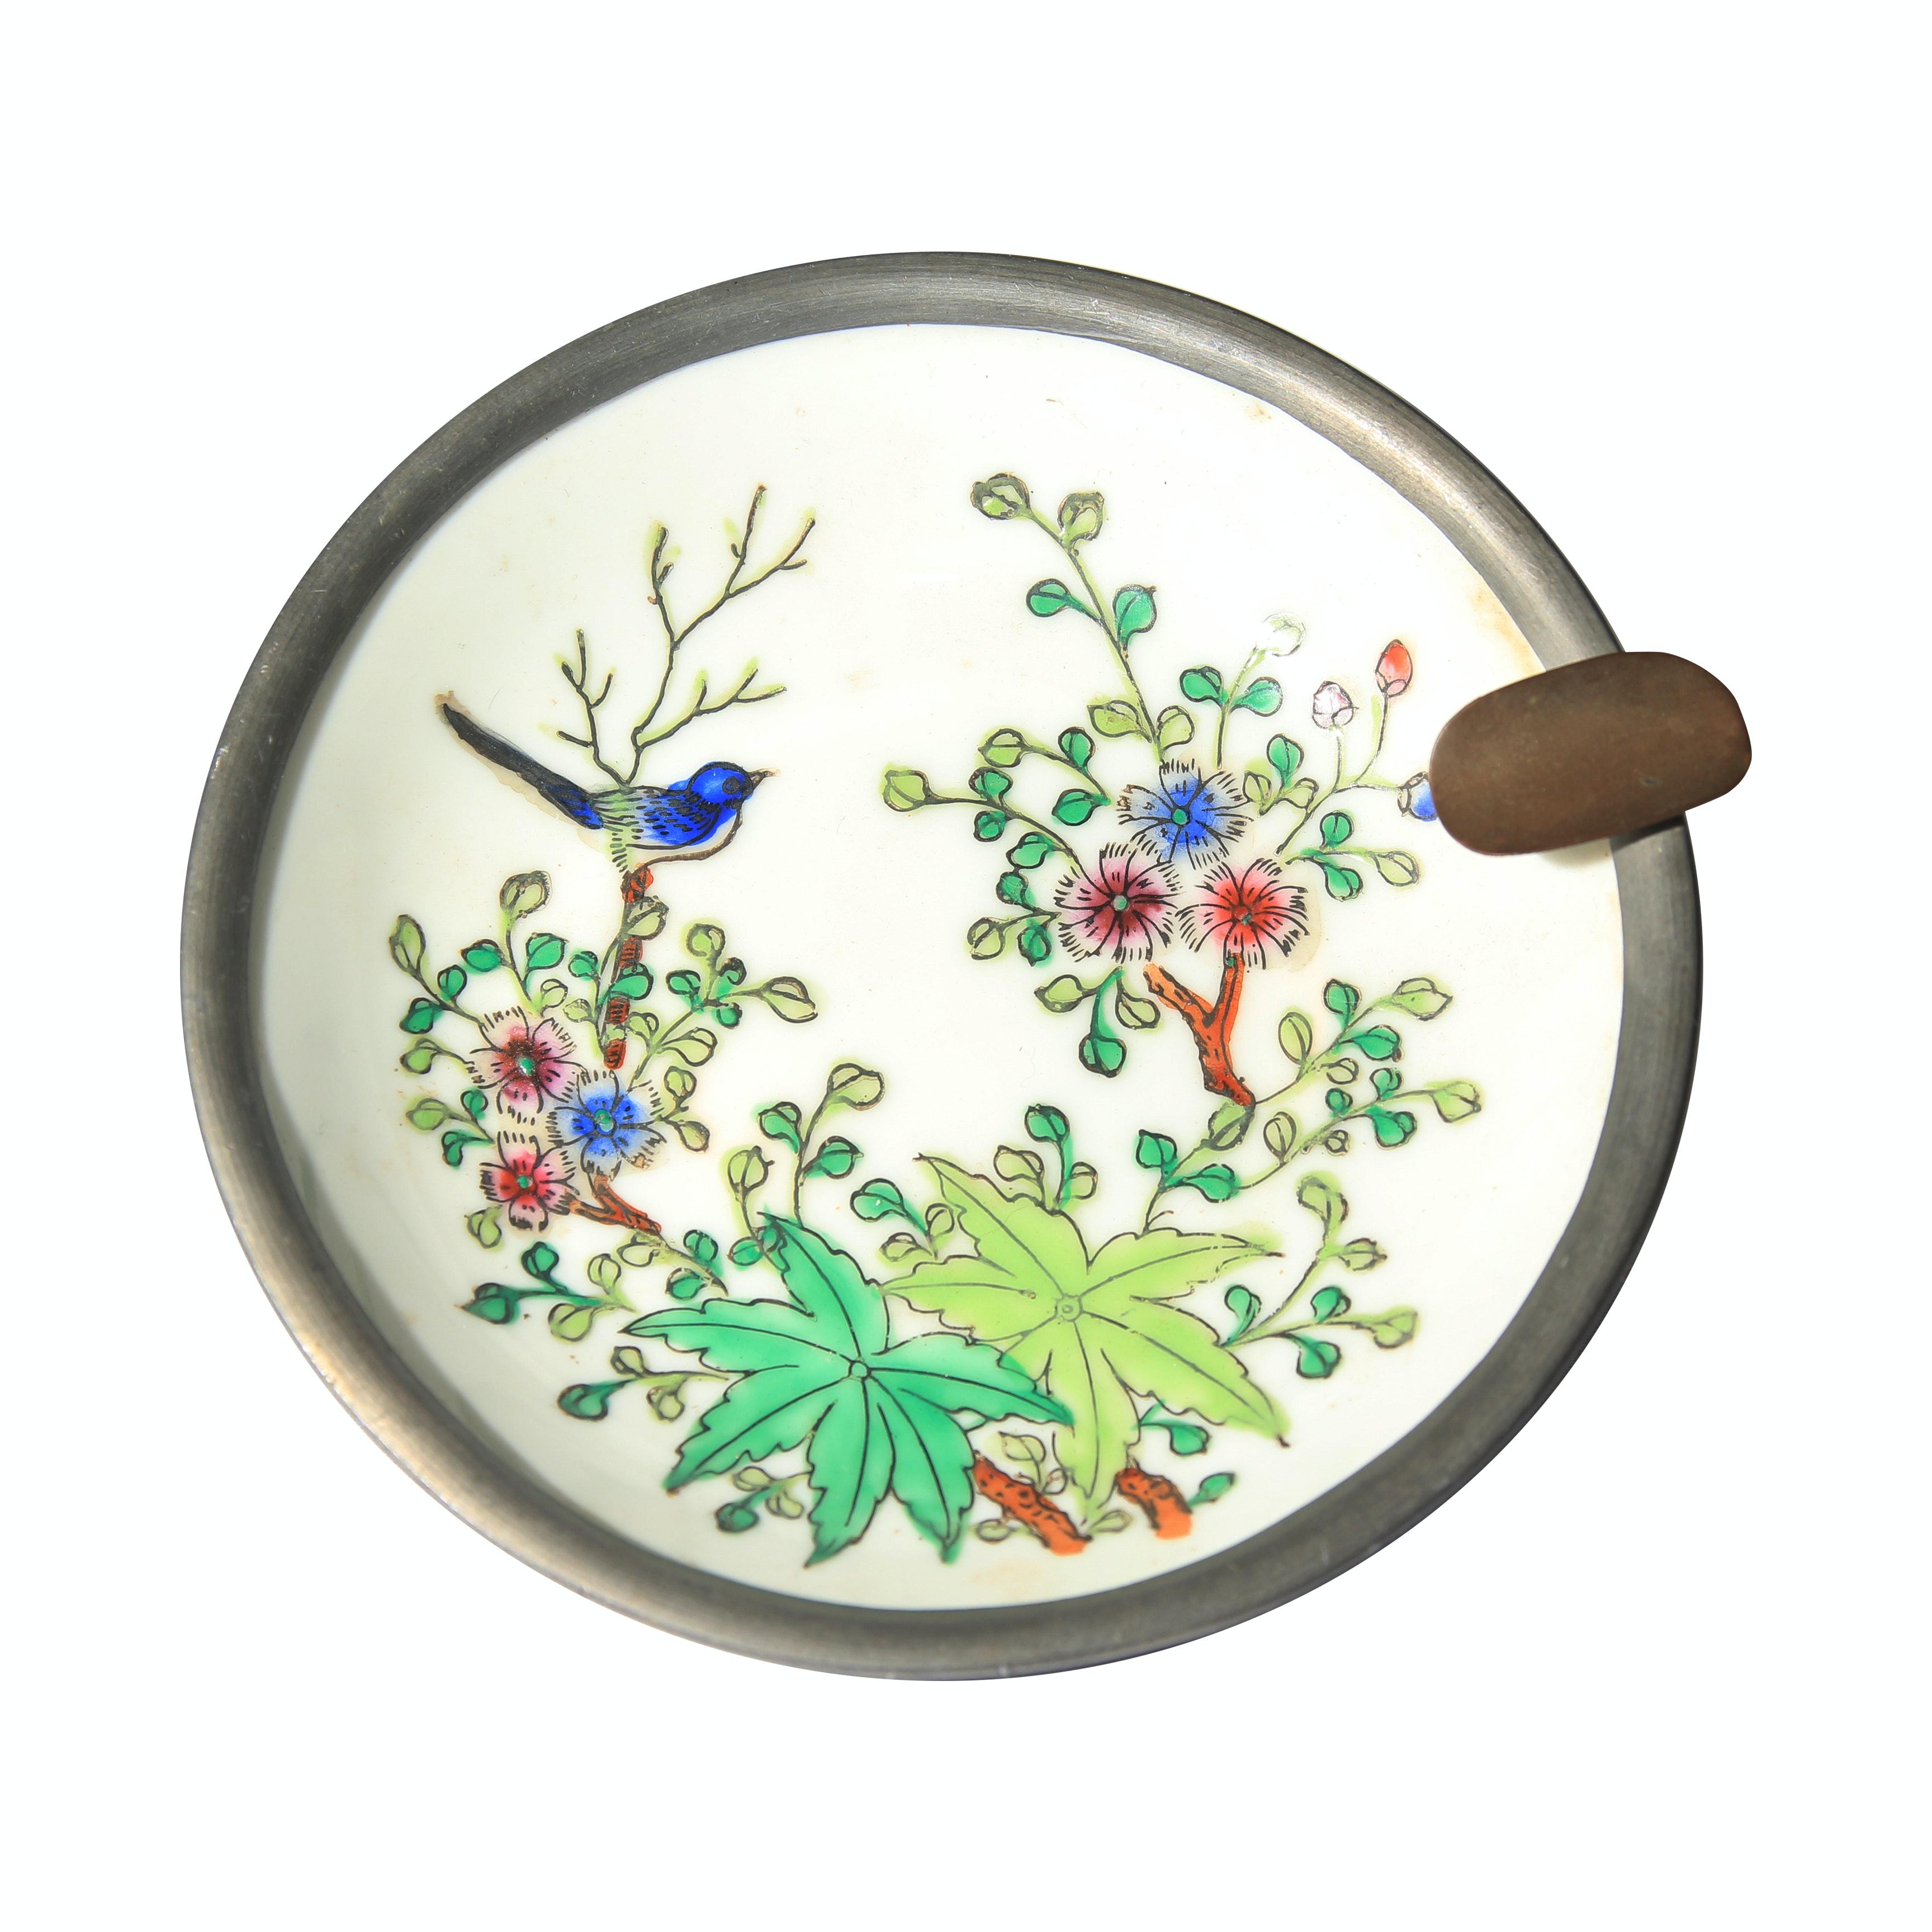 Vintage Japanese Porcelain Ware and Pewter Ashtray